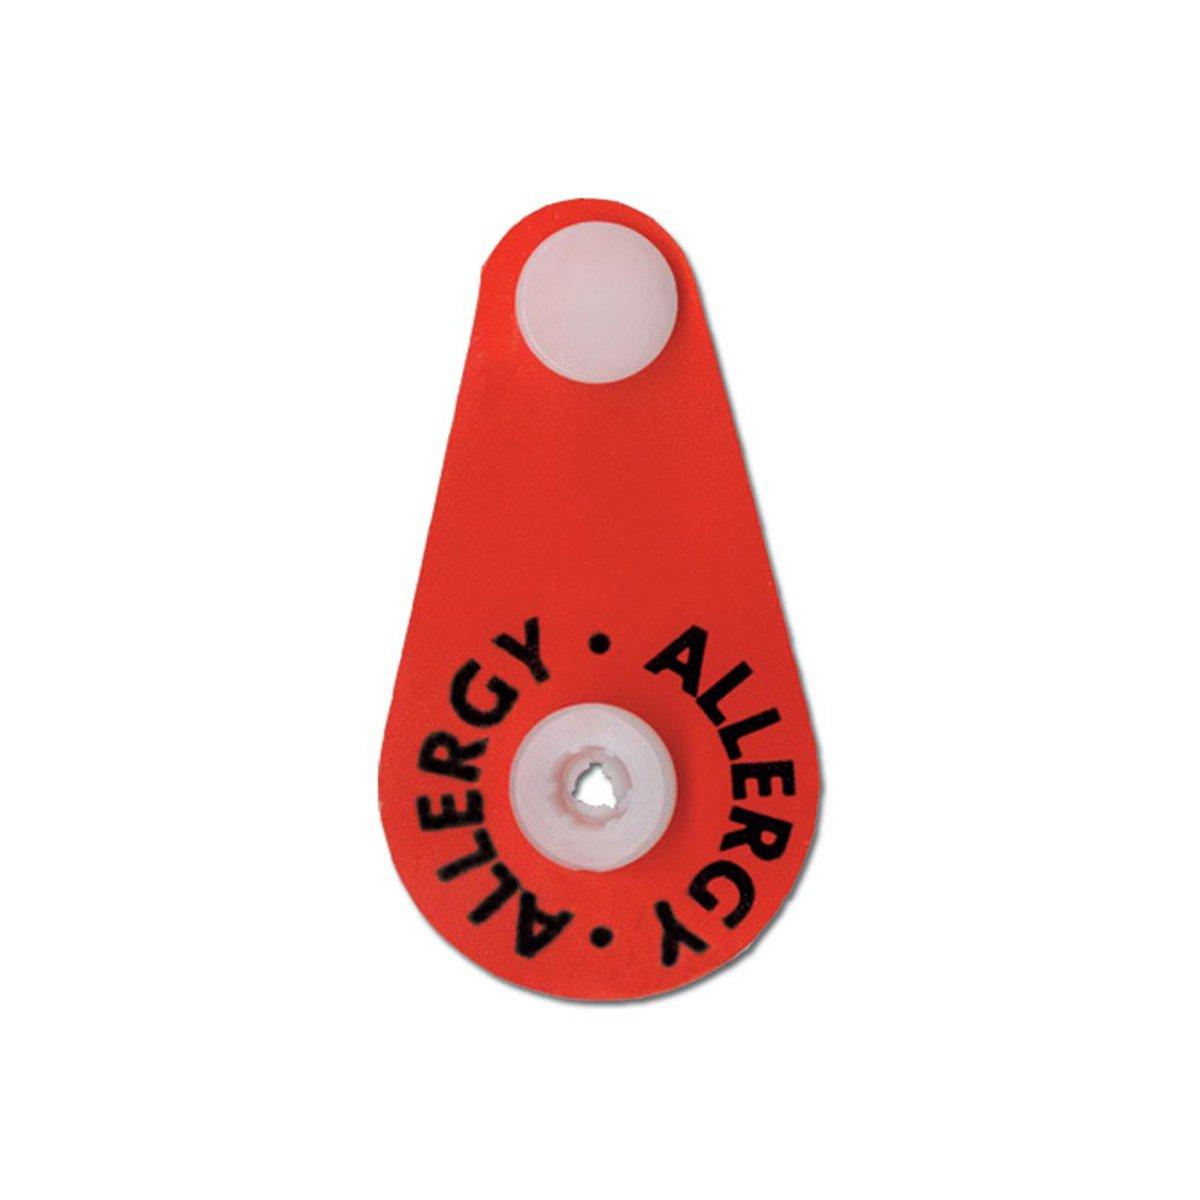 IDENT-ALERT 8621A-16-PDH Alert Bands Clasp, Poly